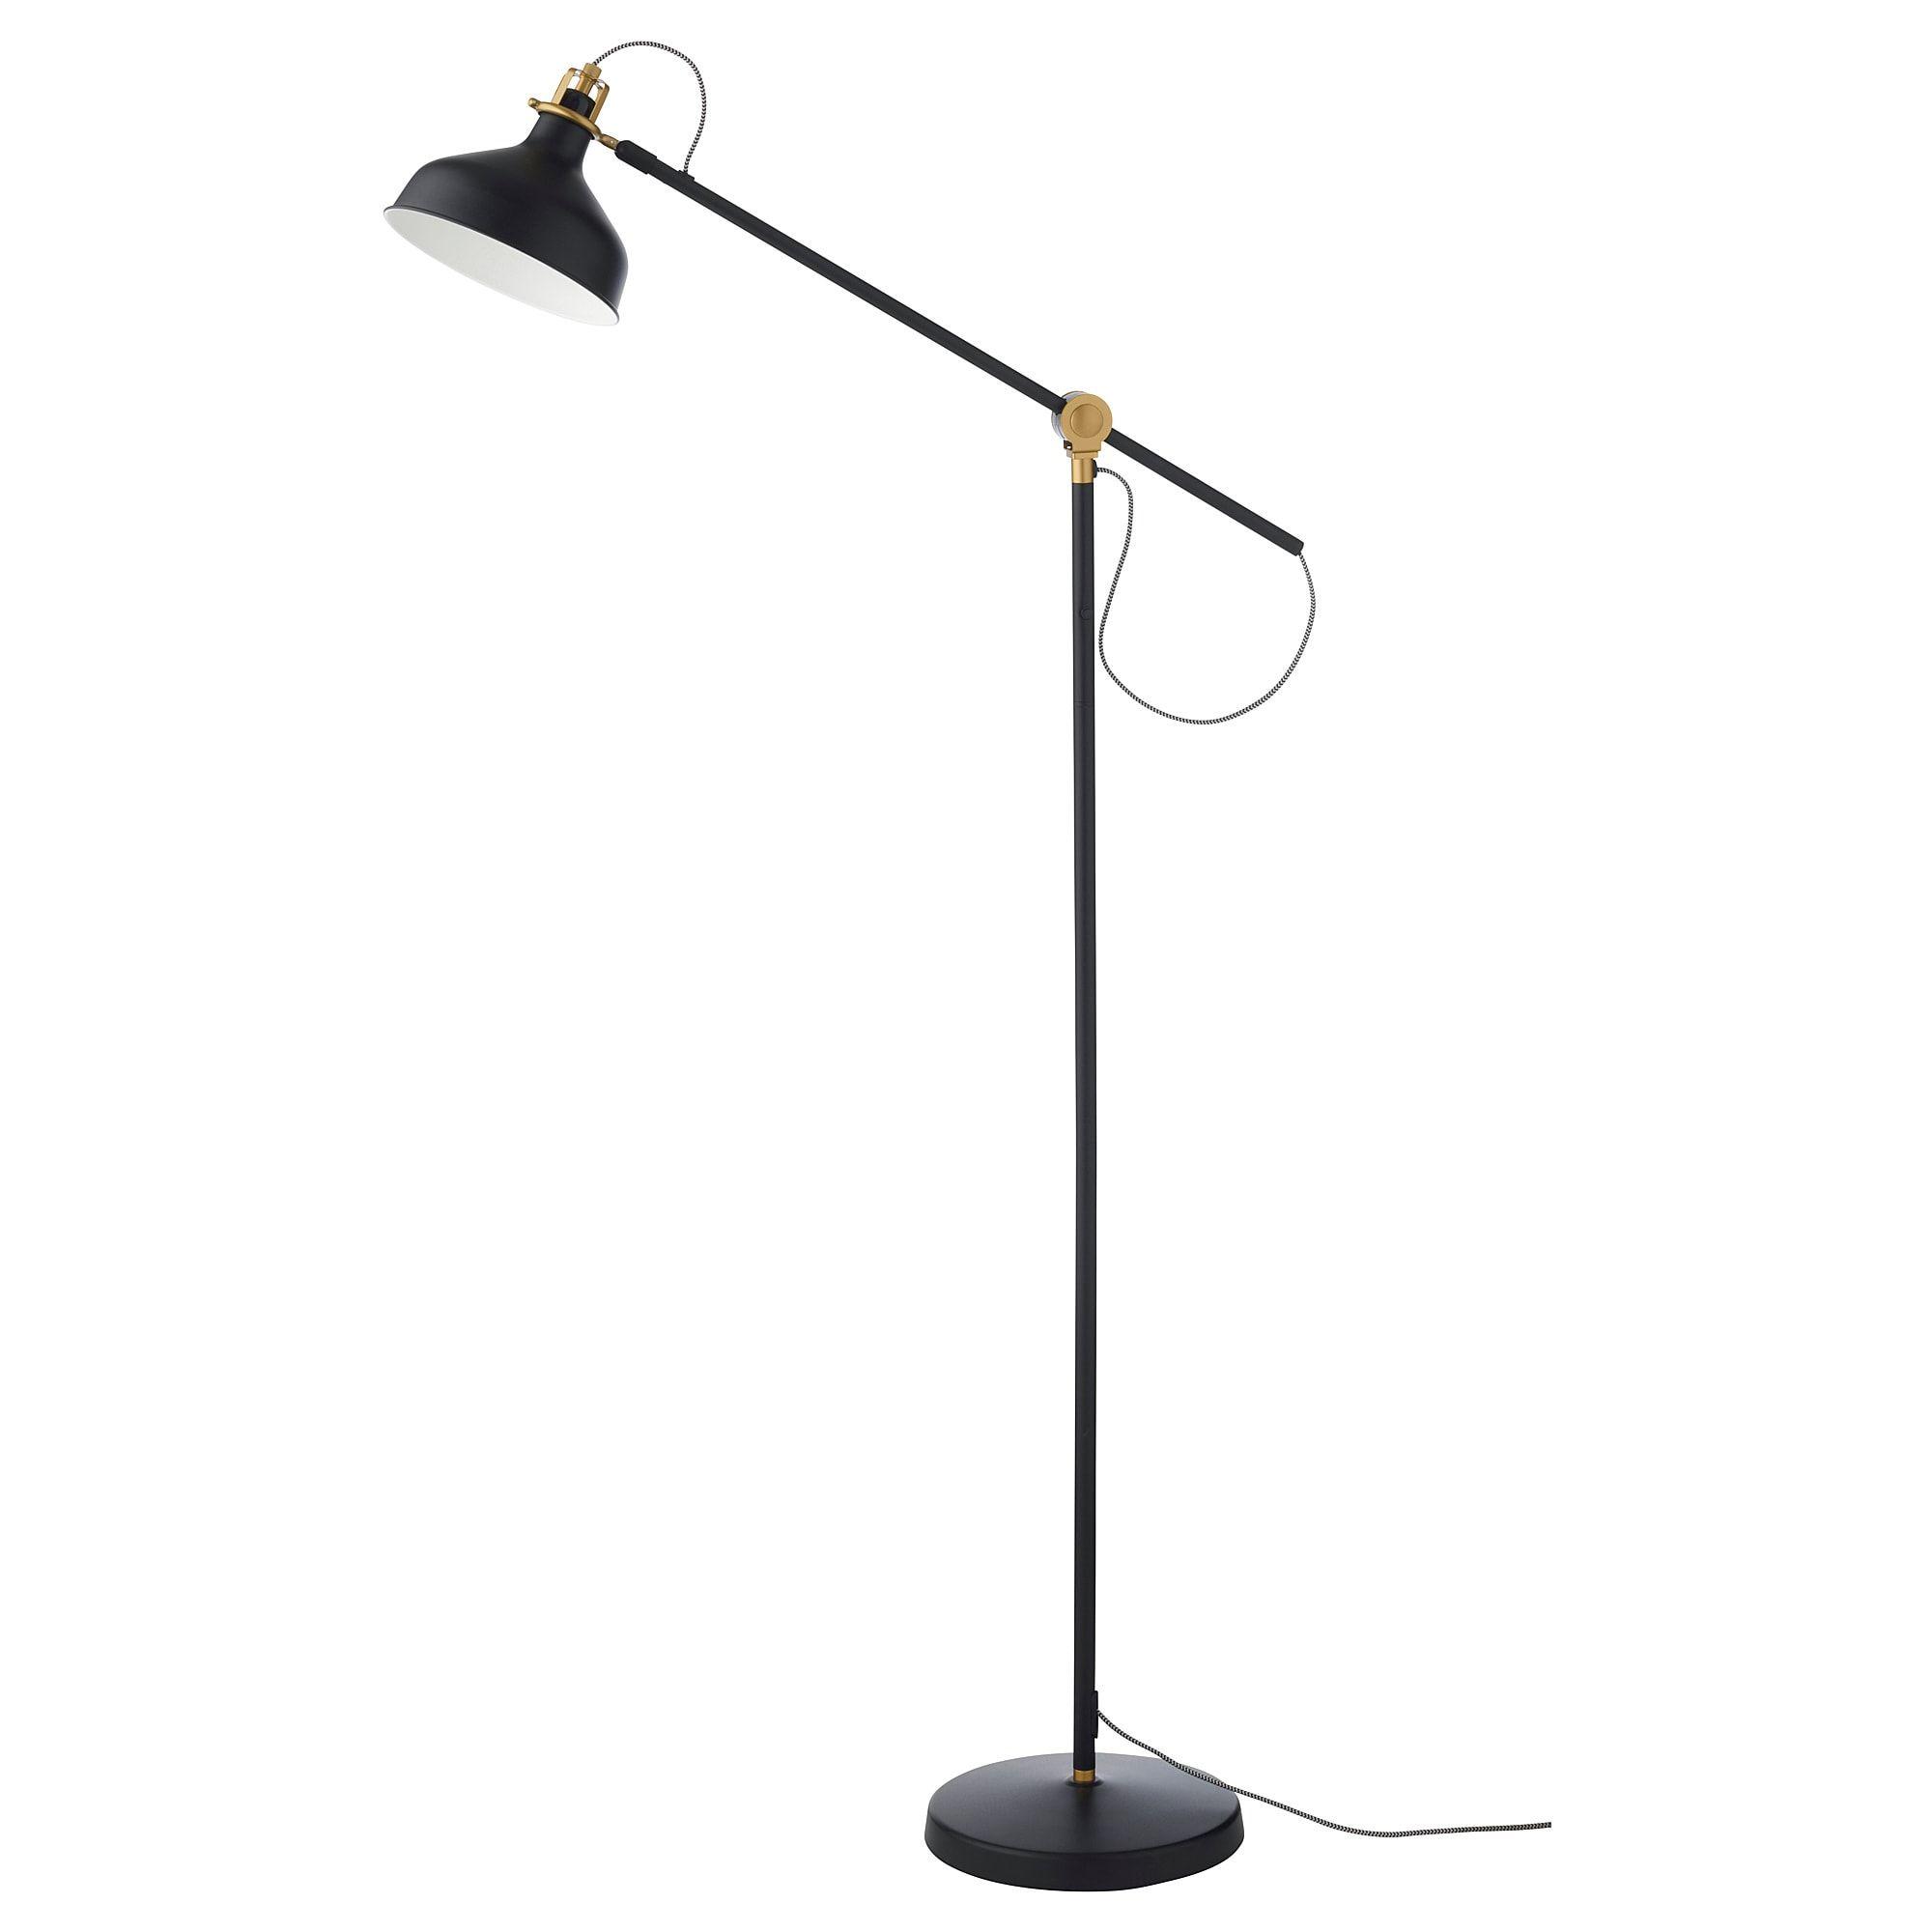 Ikea Ranarp Black Floor Reading Lamp With Led Bulb Ikea Floor